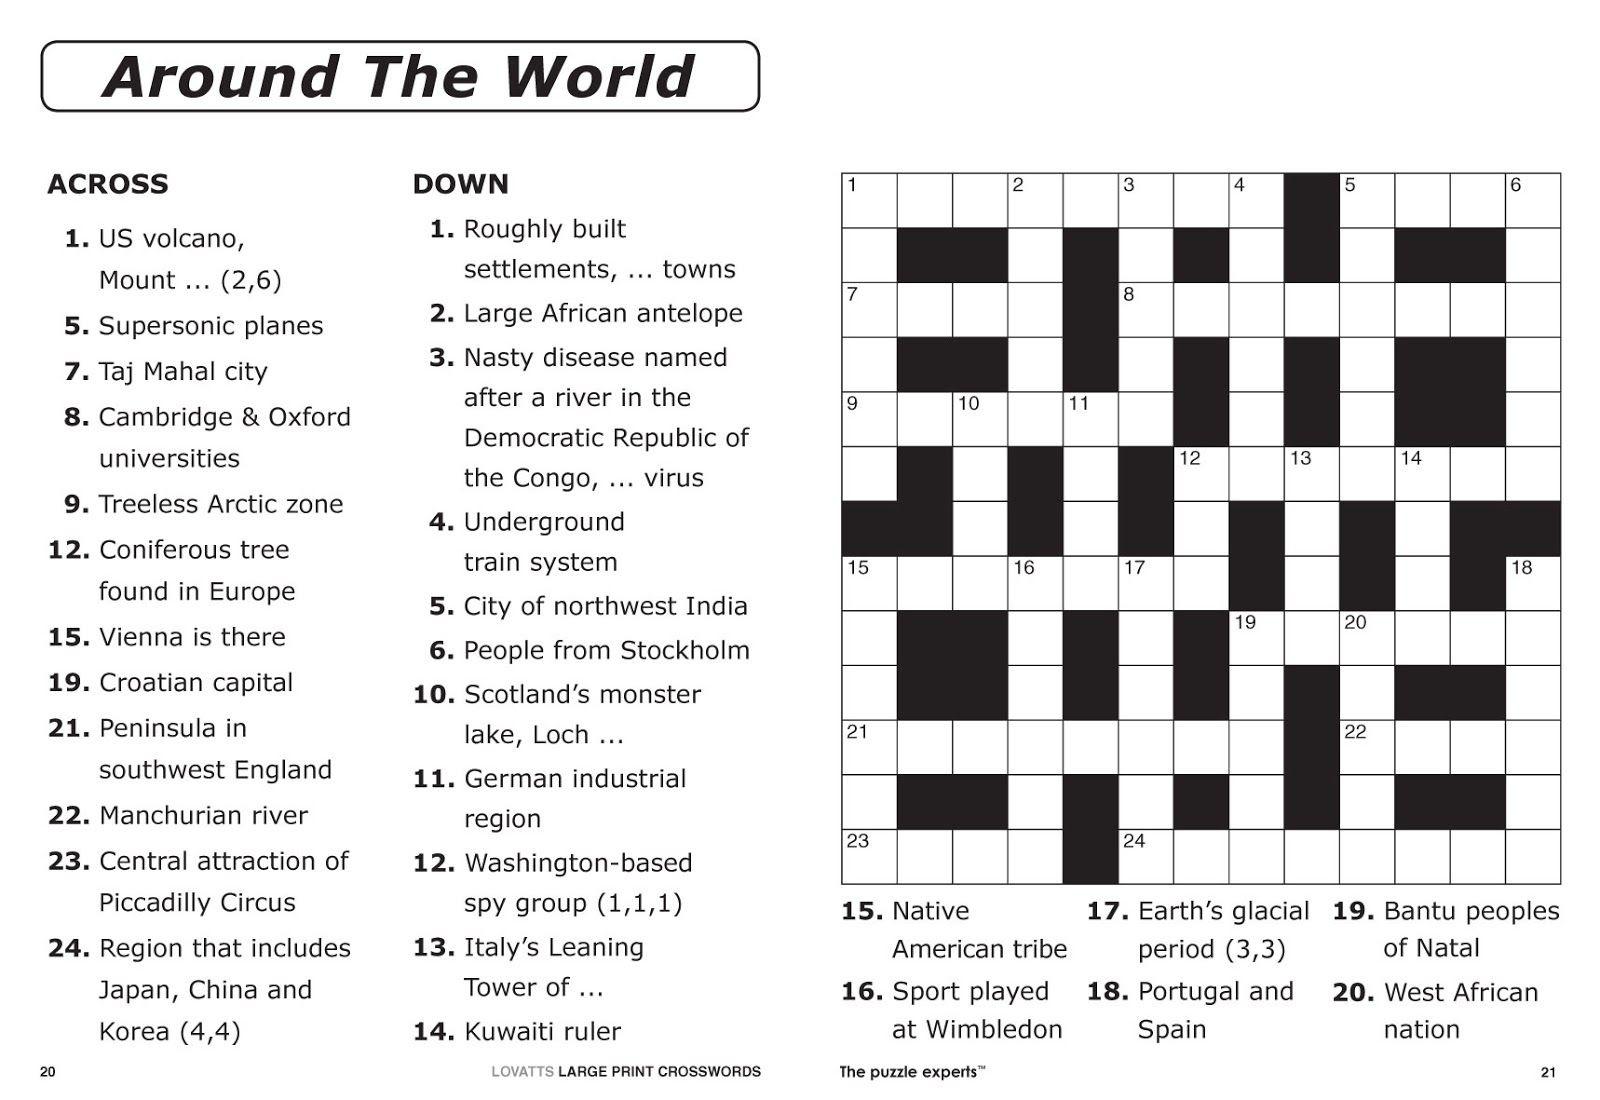 Free Printable Large Print Crossword Puzzles   M3U8 - Free Printable Puzzles